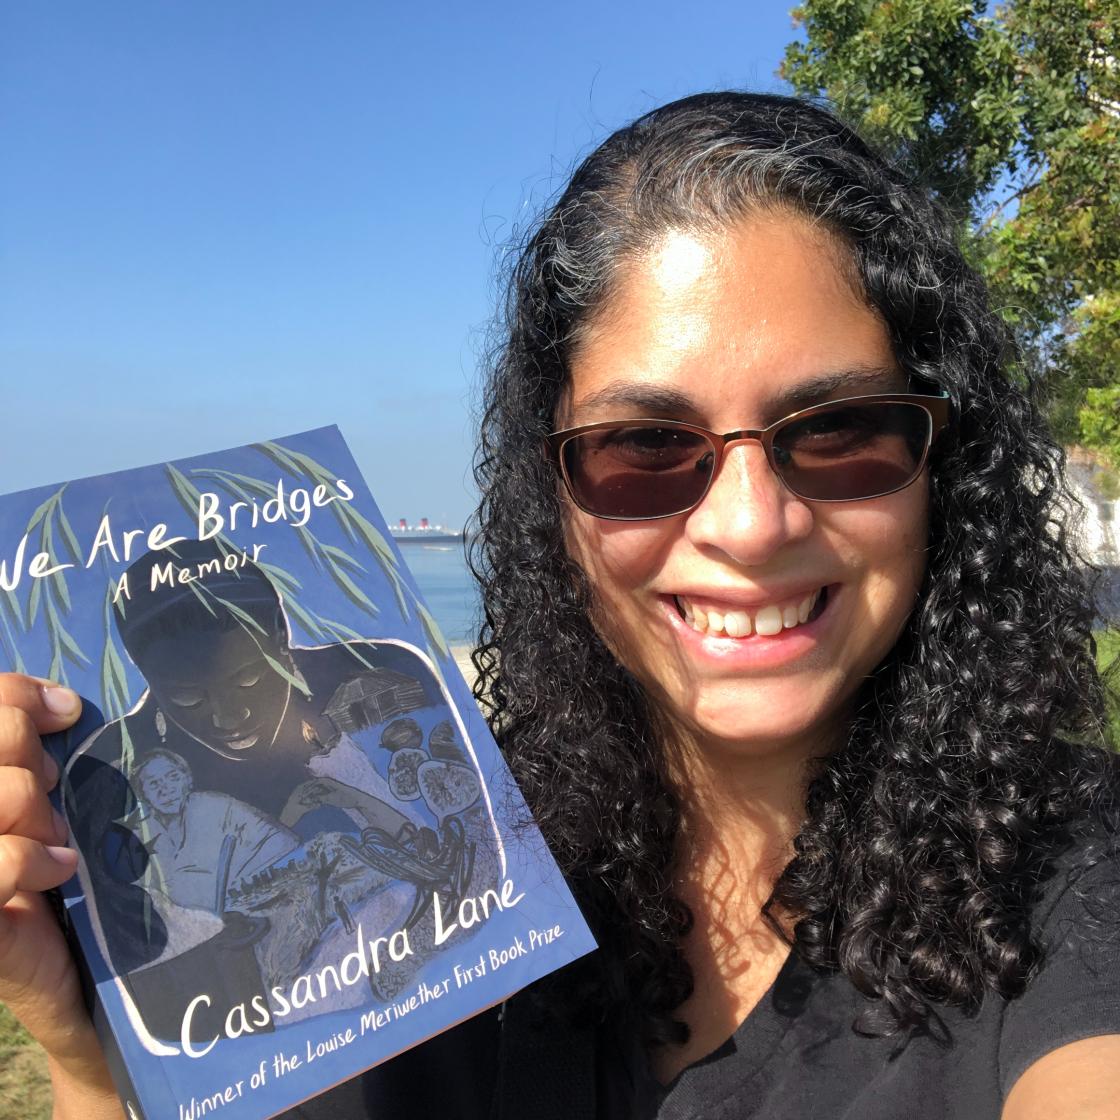 Li Yun holding a copy of WE ARE BRIDGES by Cassandra Lane